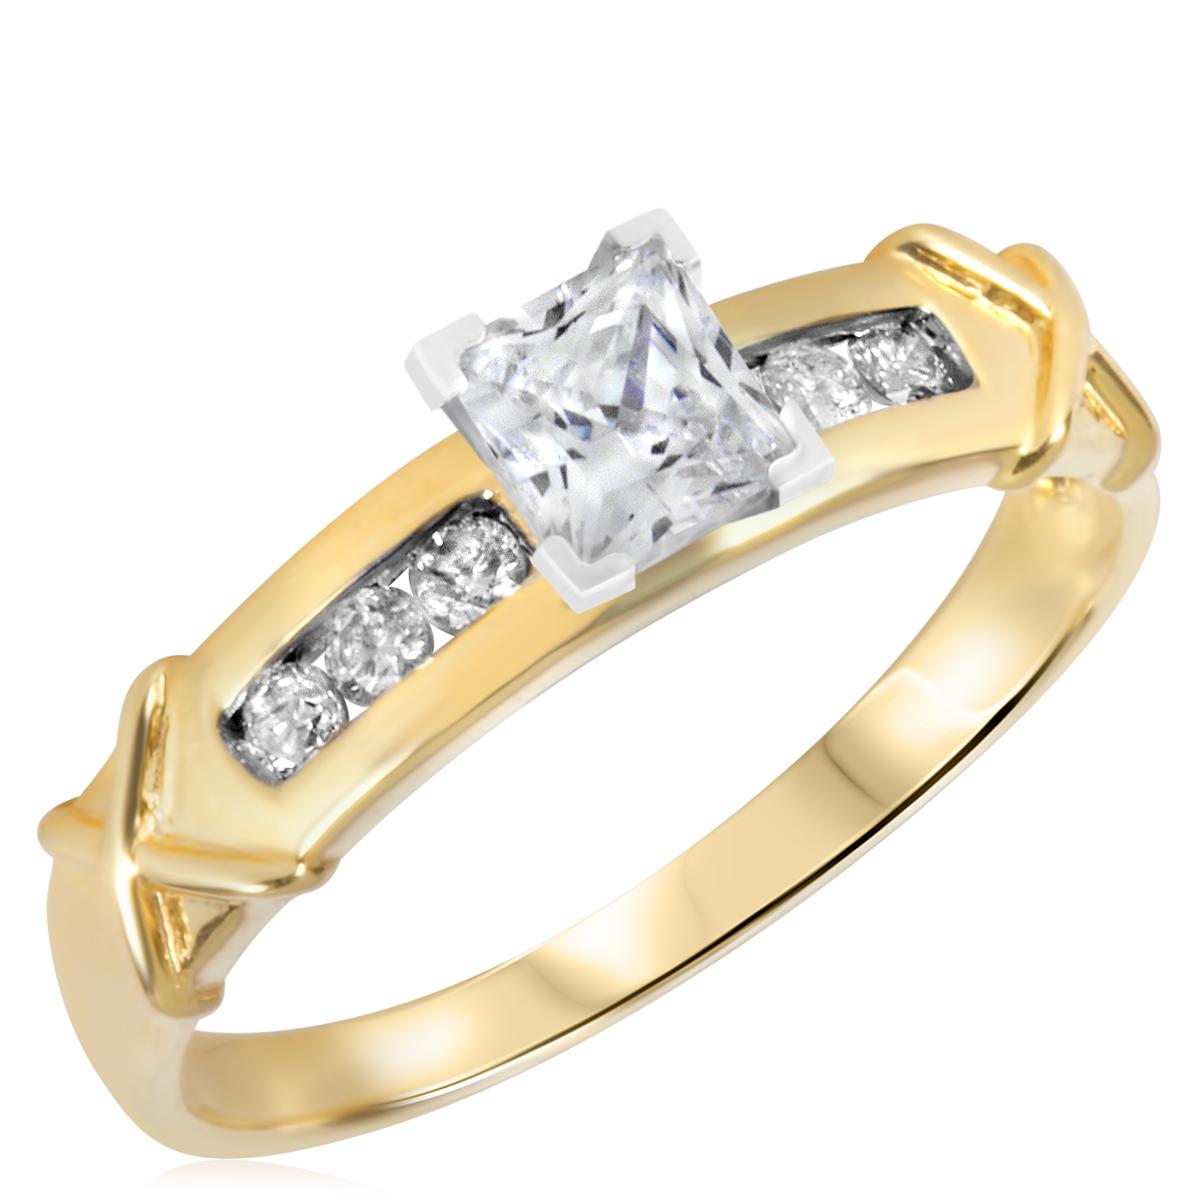 2/3 CT. T.W. Diamond Ladies Engagement Ring 10K Yellow Gold- Size 8